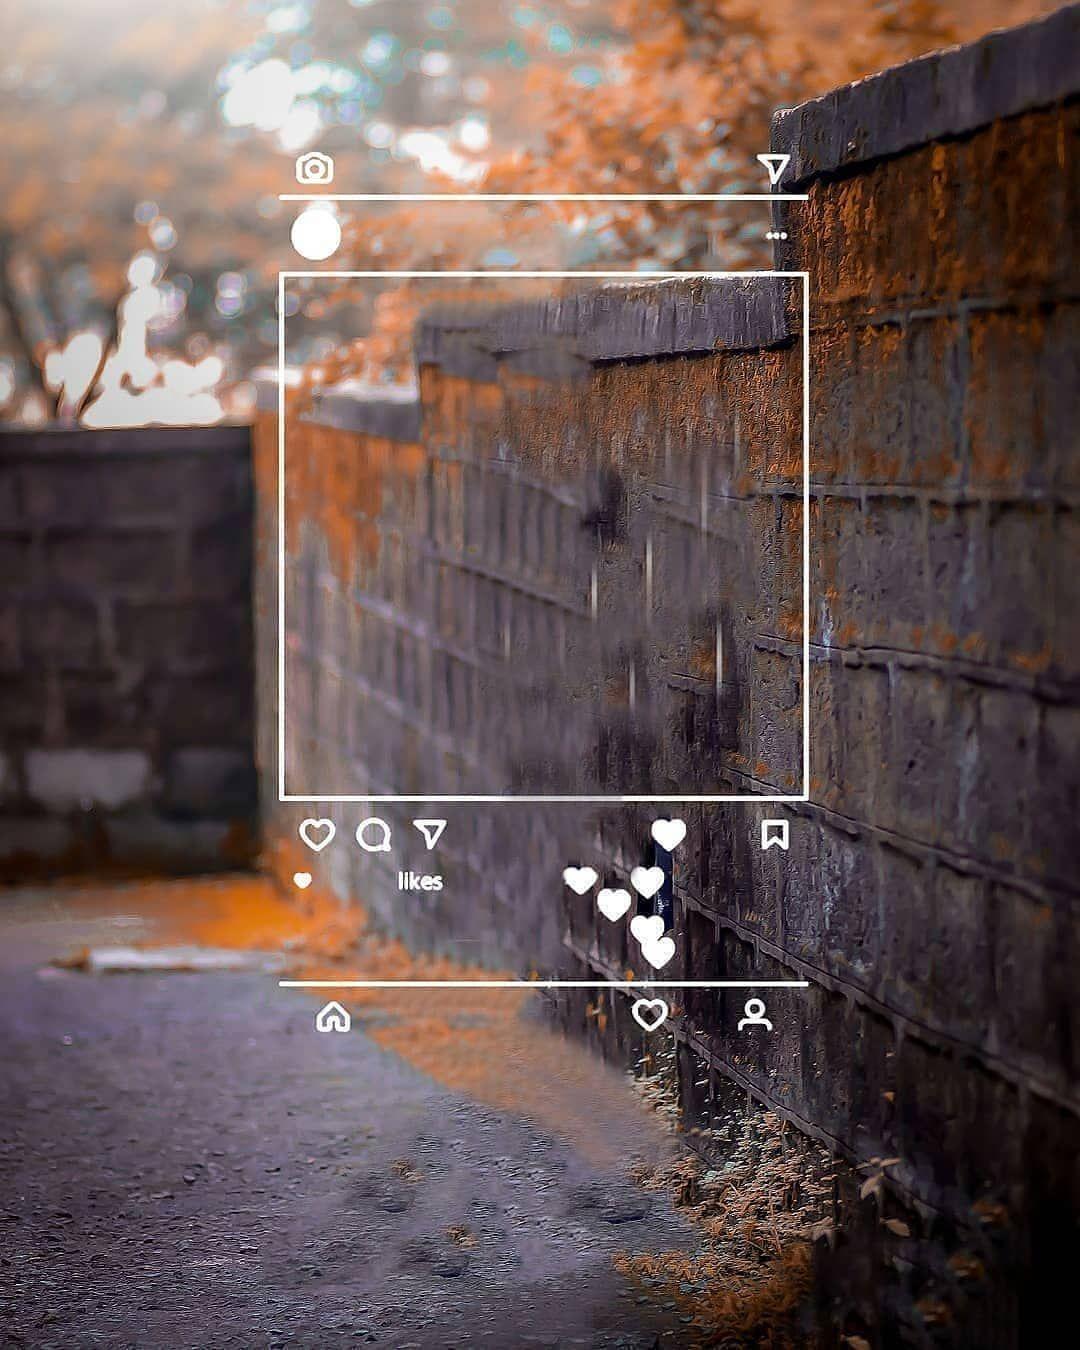 250 Neueste Hd Hintergrund Fur Die Bearbeitung Picsart Background Iphone Background Images Dslr Background Images